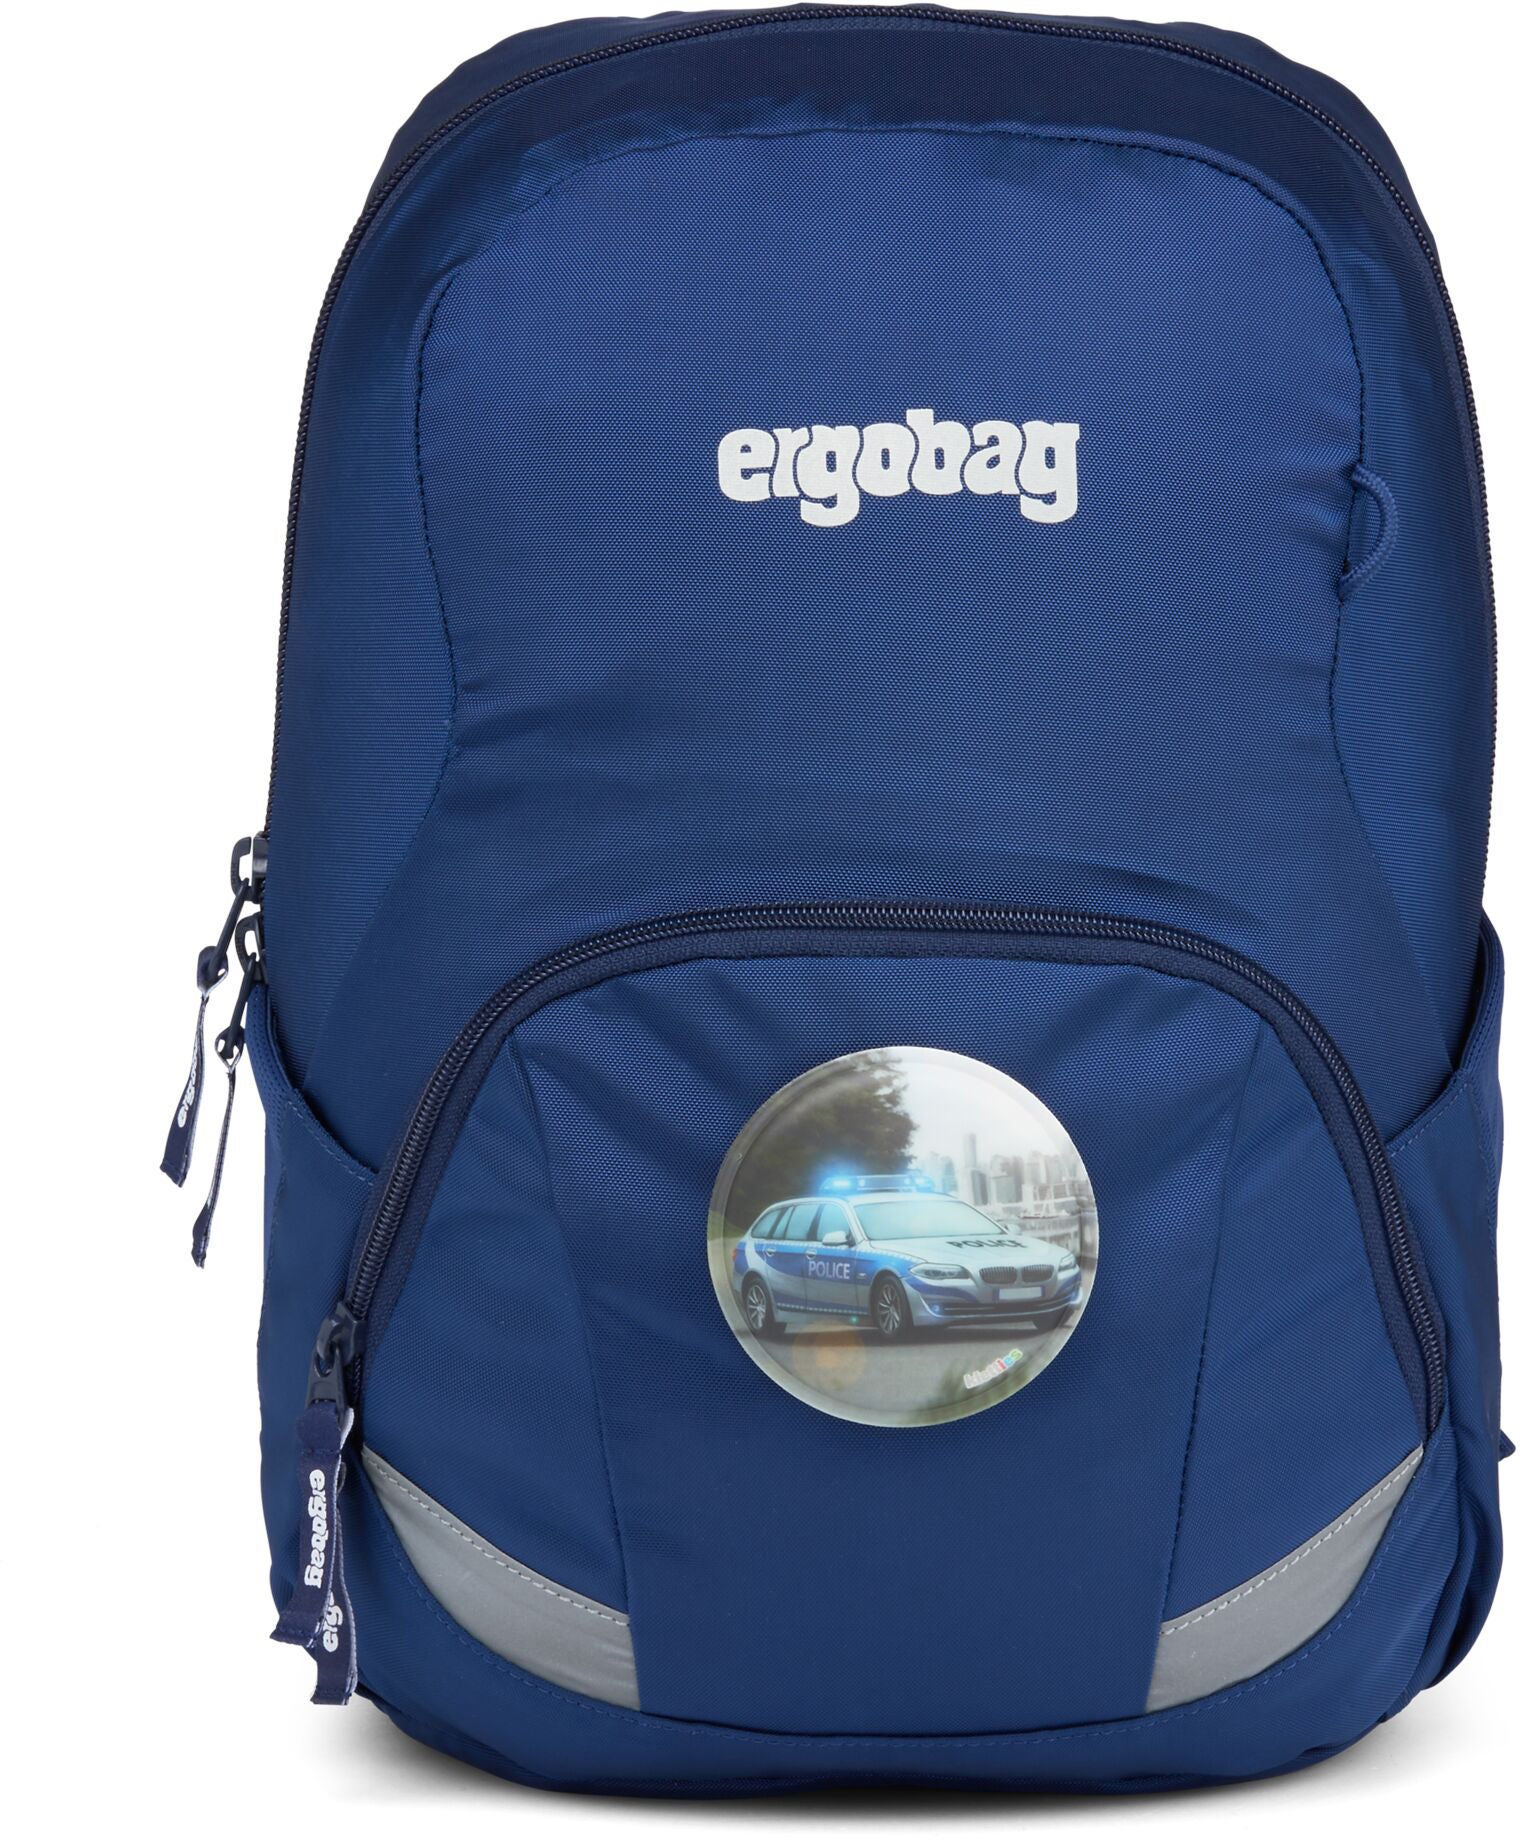 Ergobag Ease Bluelight Ryggsäck 10L, Blue